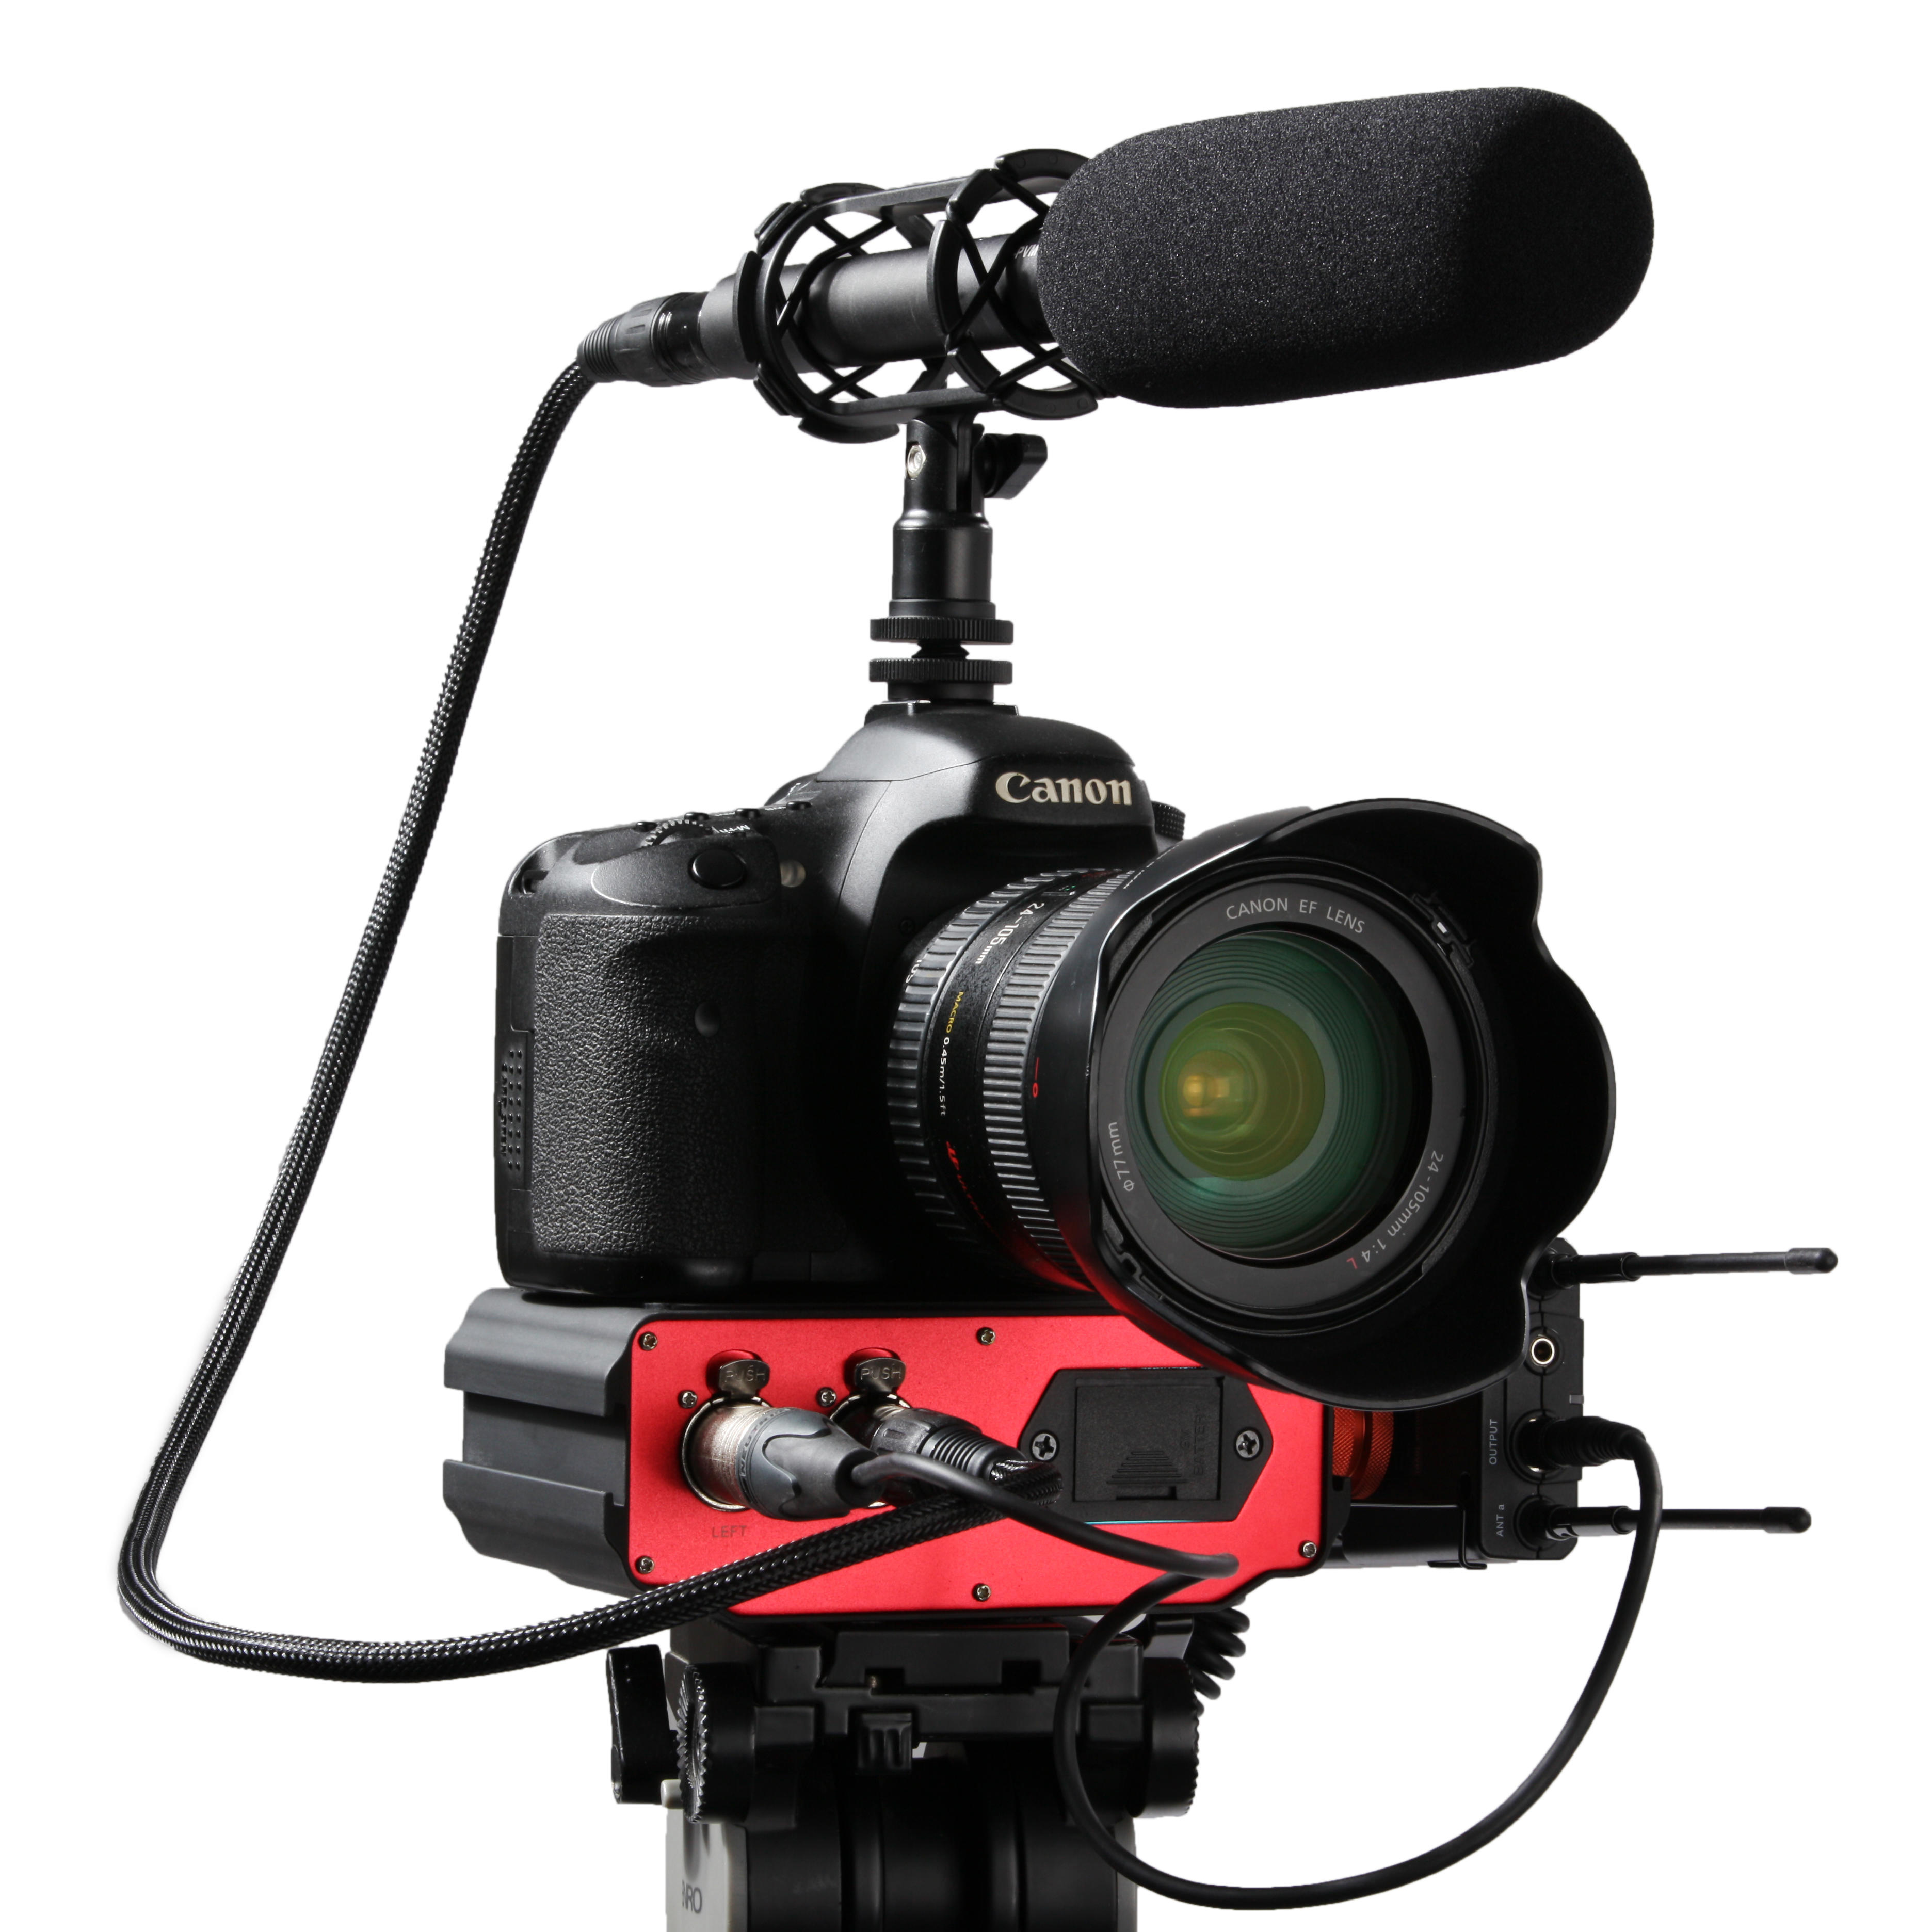 Gravador de áudio Saramonic SR-AX107 2XLR para DSLR e Camcorders